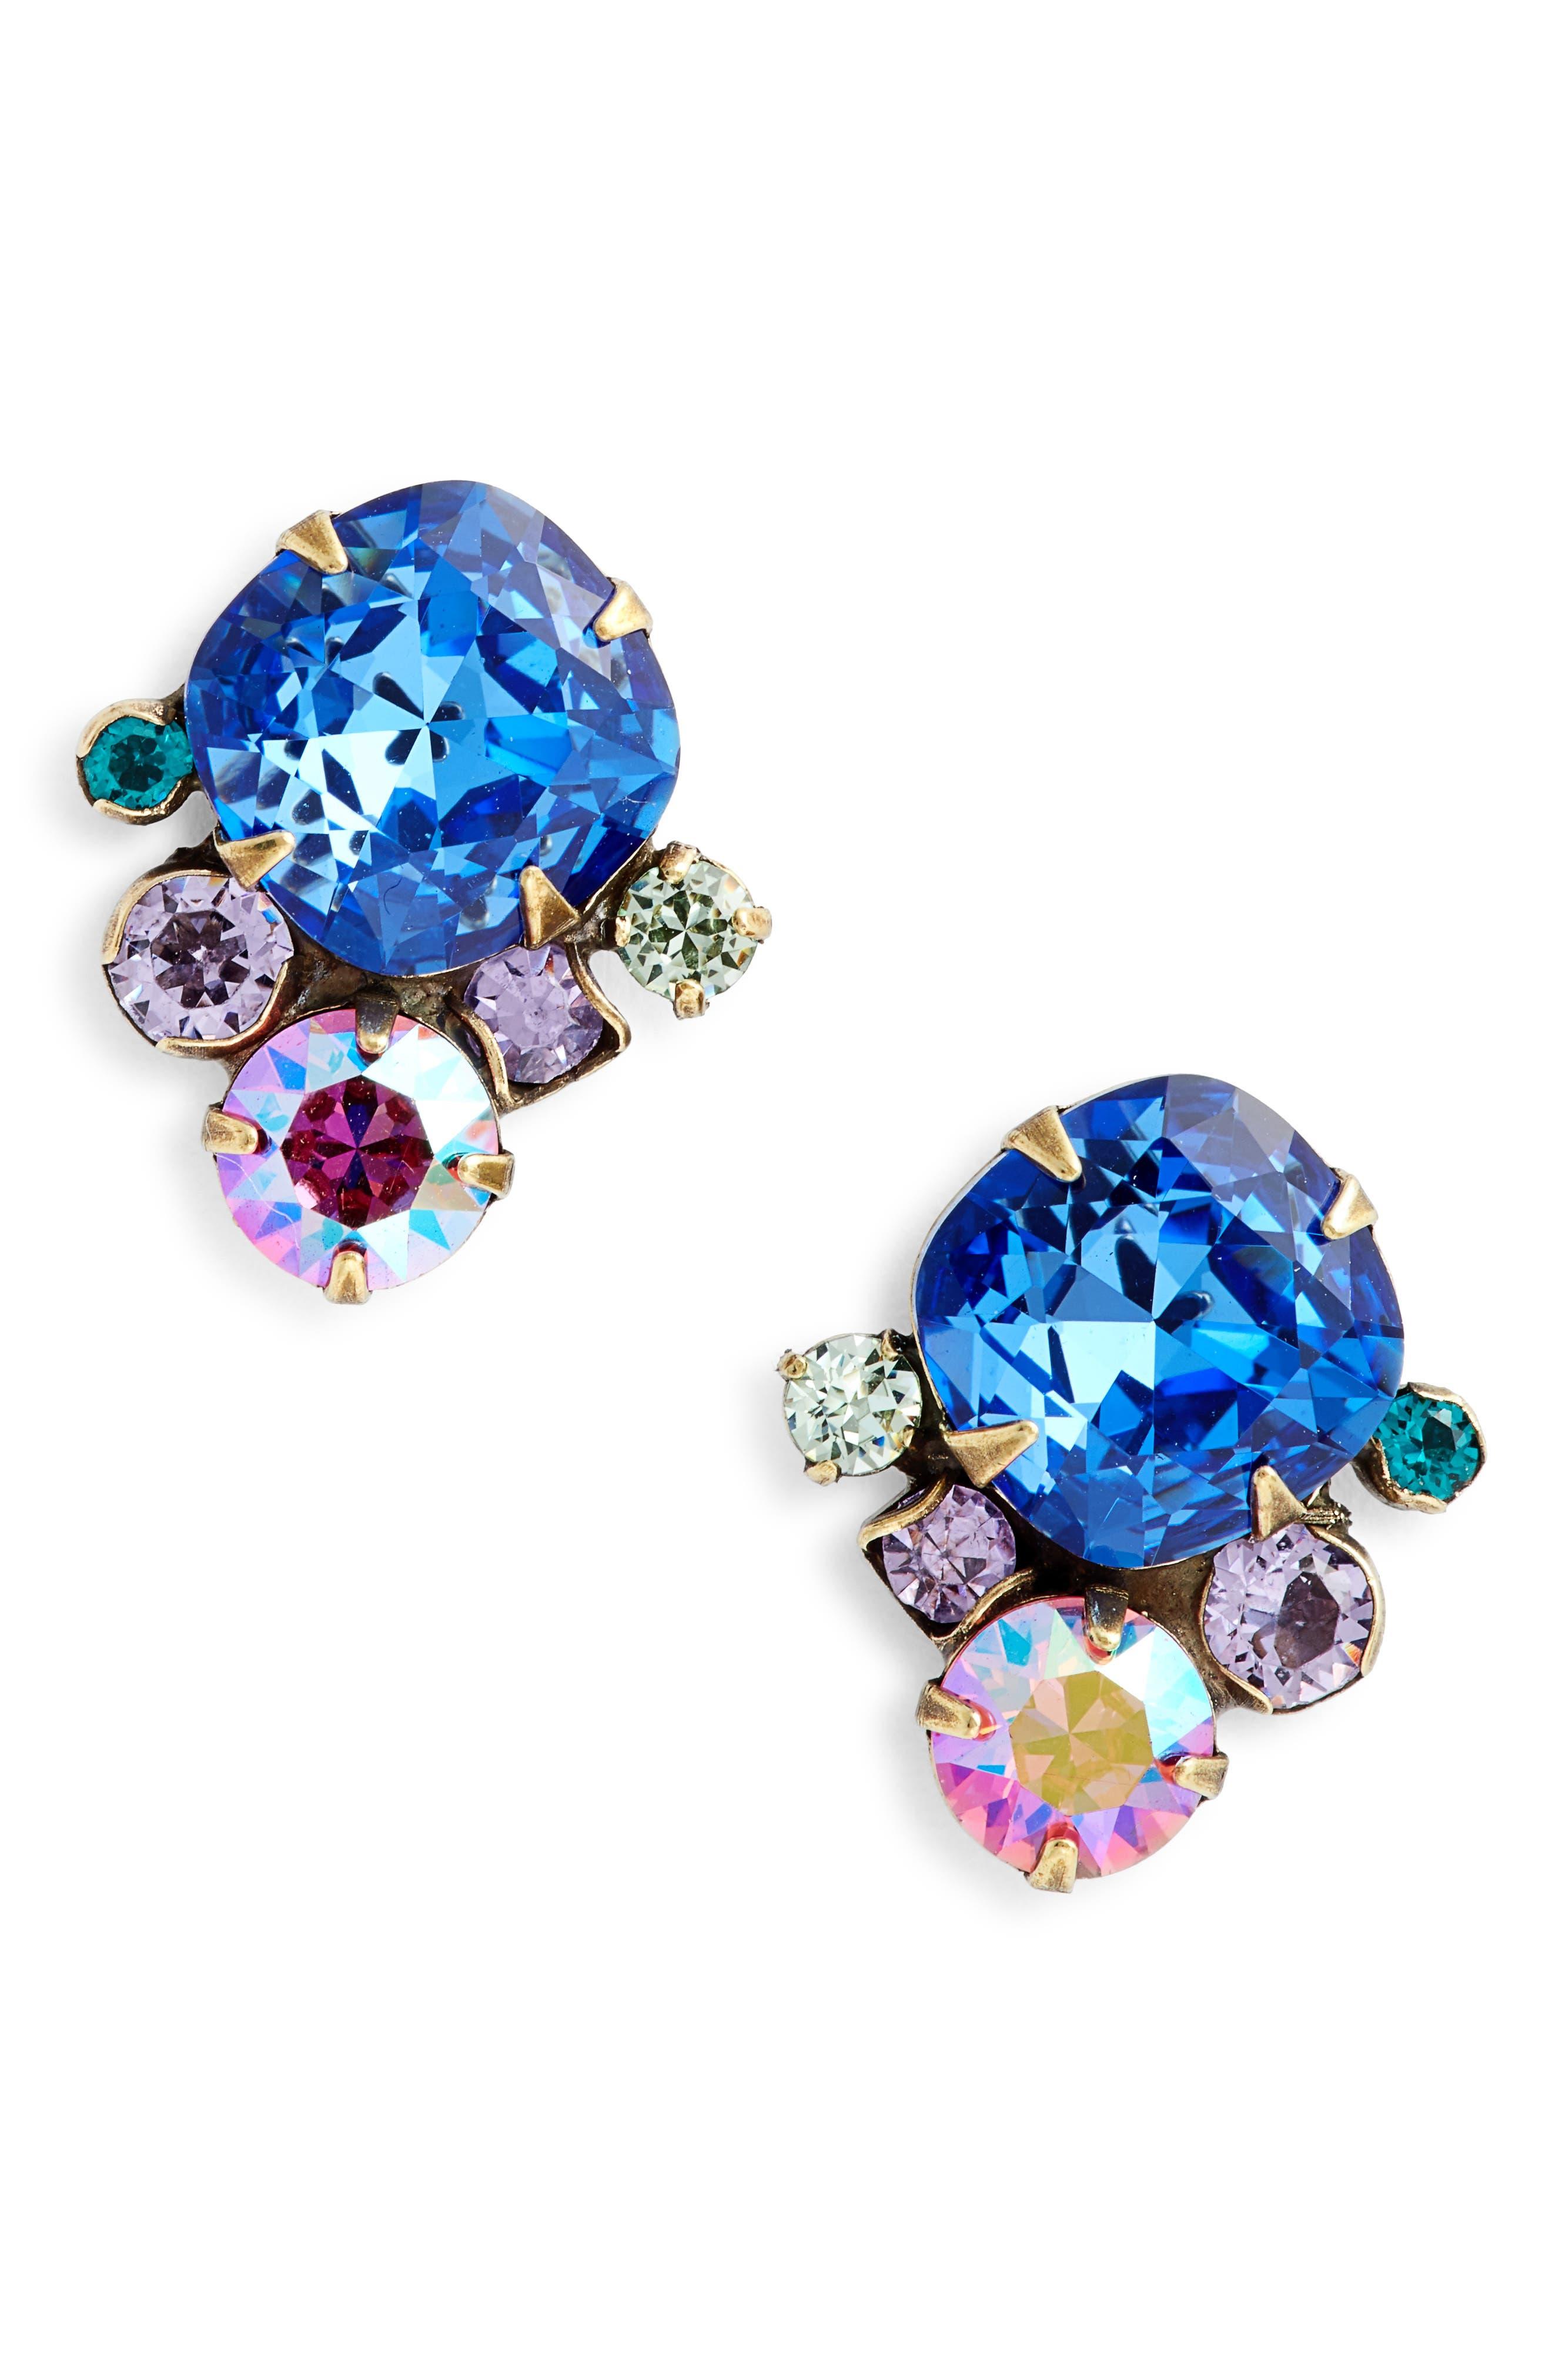 Brugmansia Crystal Earrings,                         Main,                         color, Blue